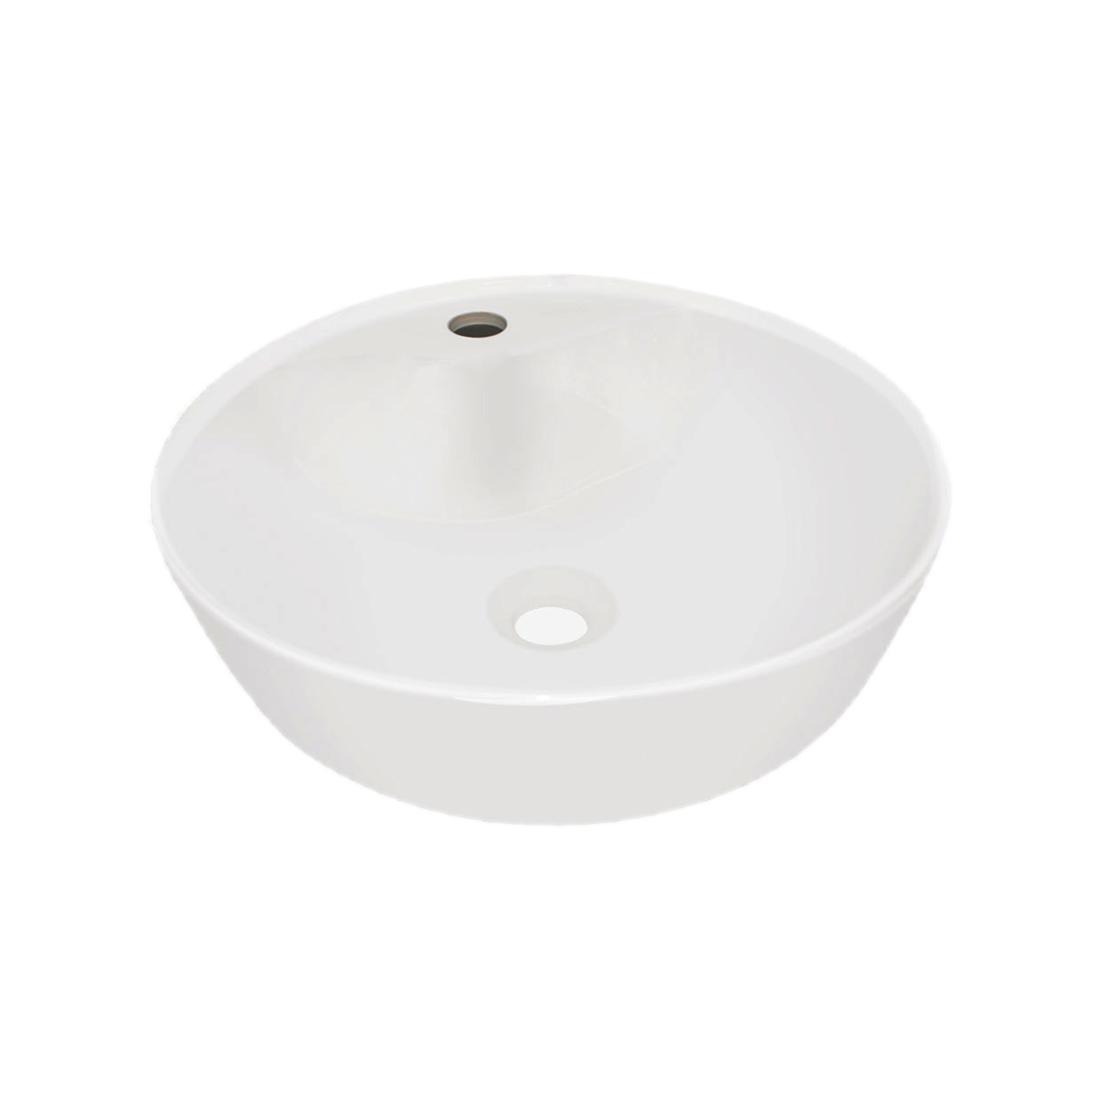 Kerovit Flora KB1090 Counter Top Wash Basin